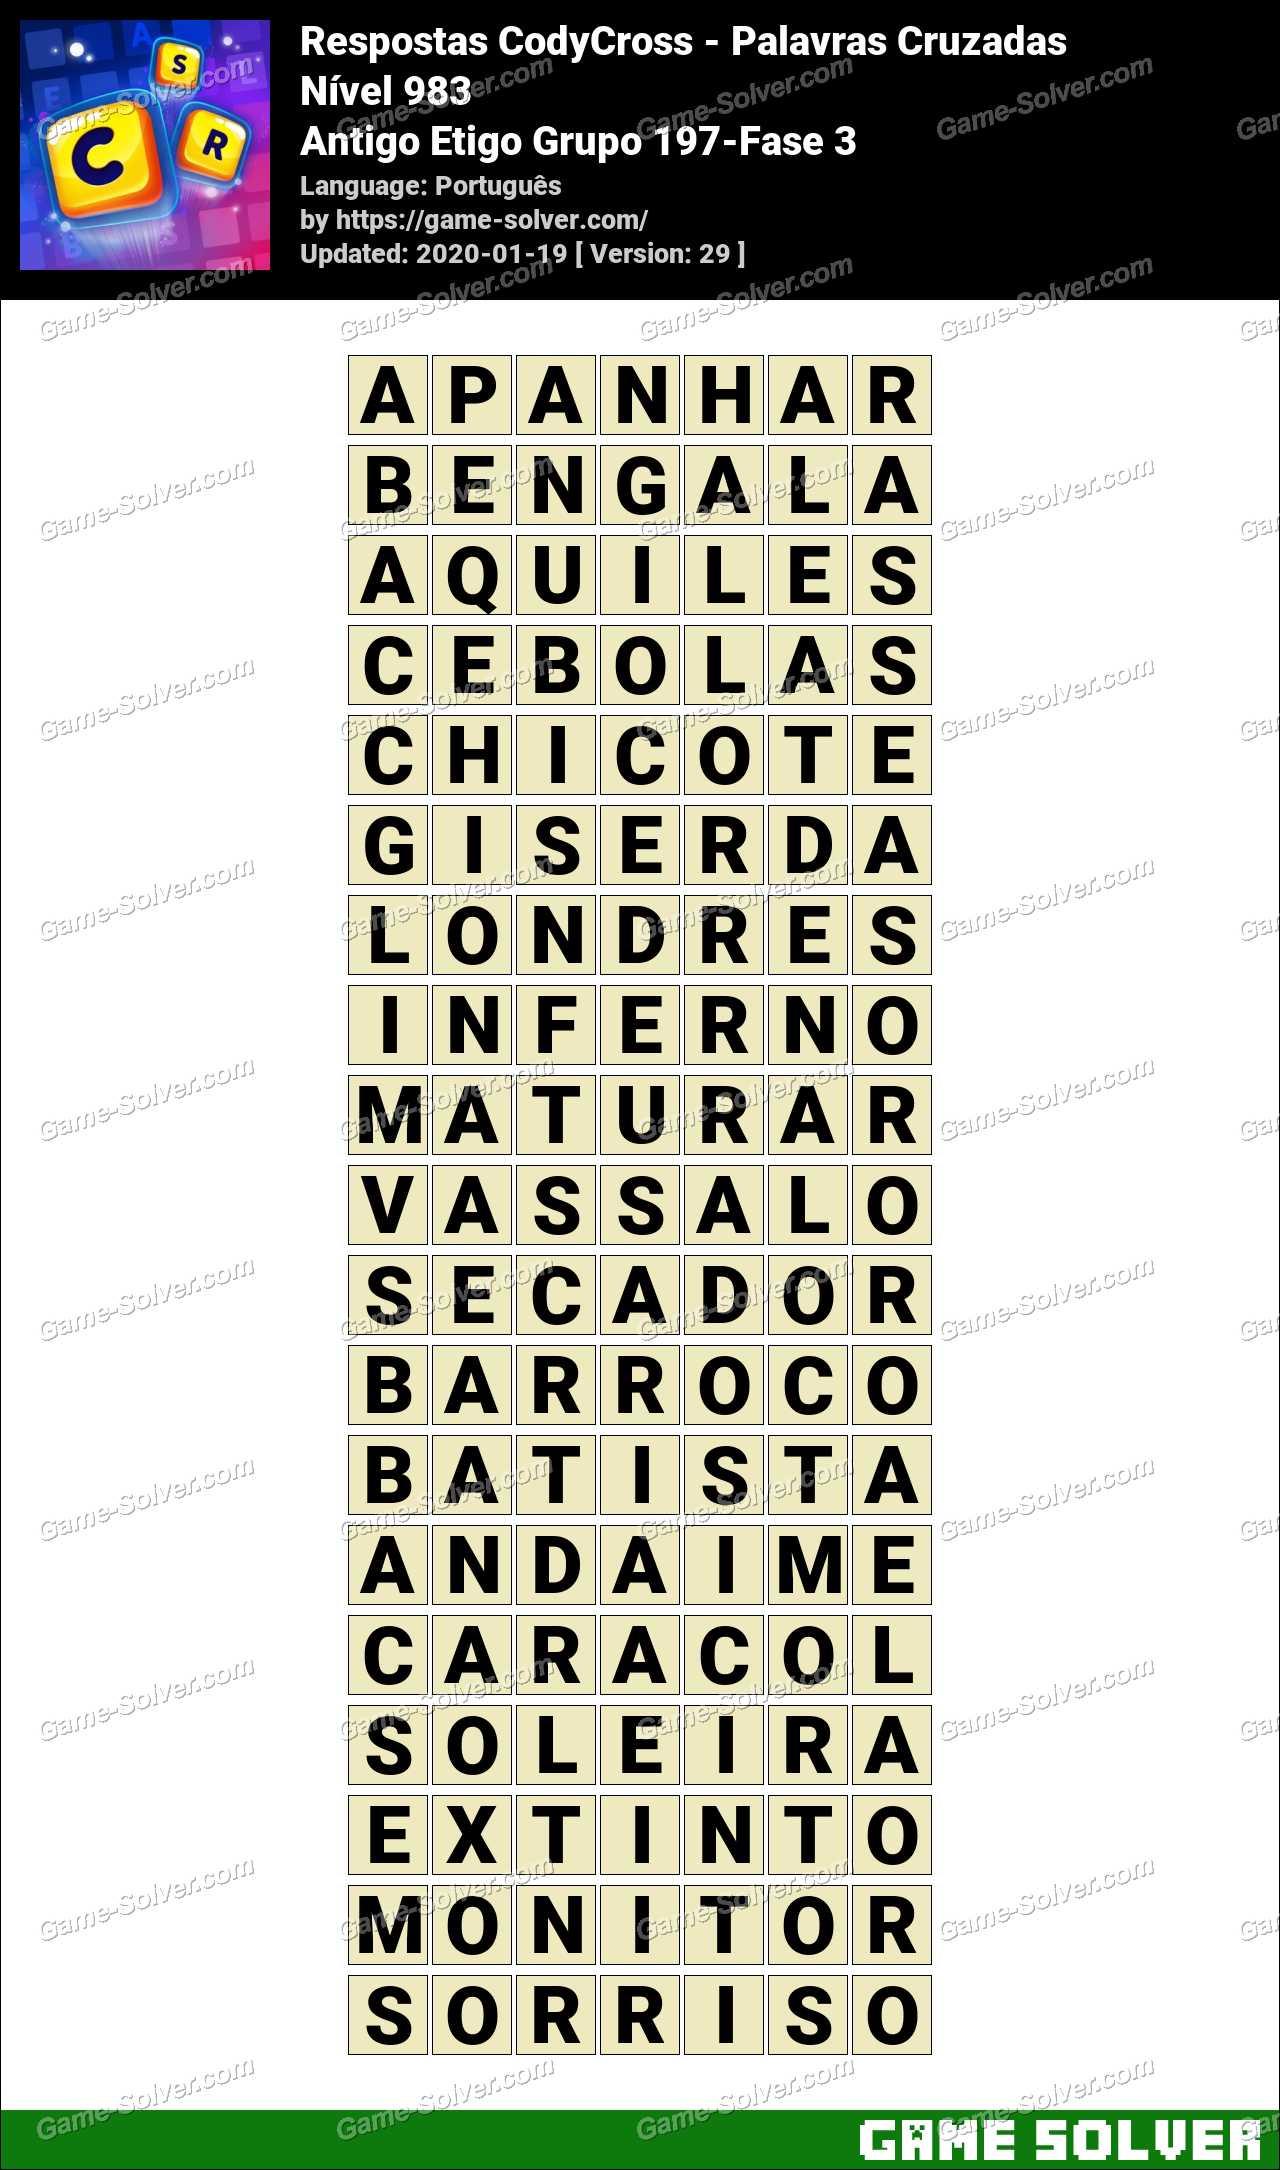 Respostas CodyCross Antigo Etigo Grupo 197-Fase 3